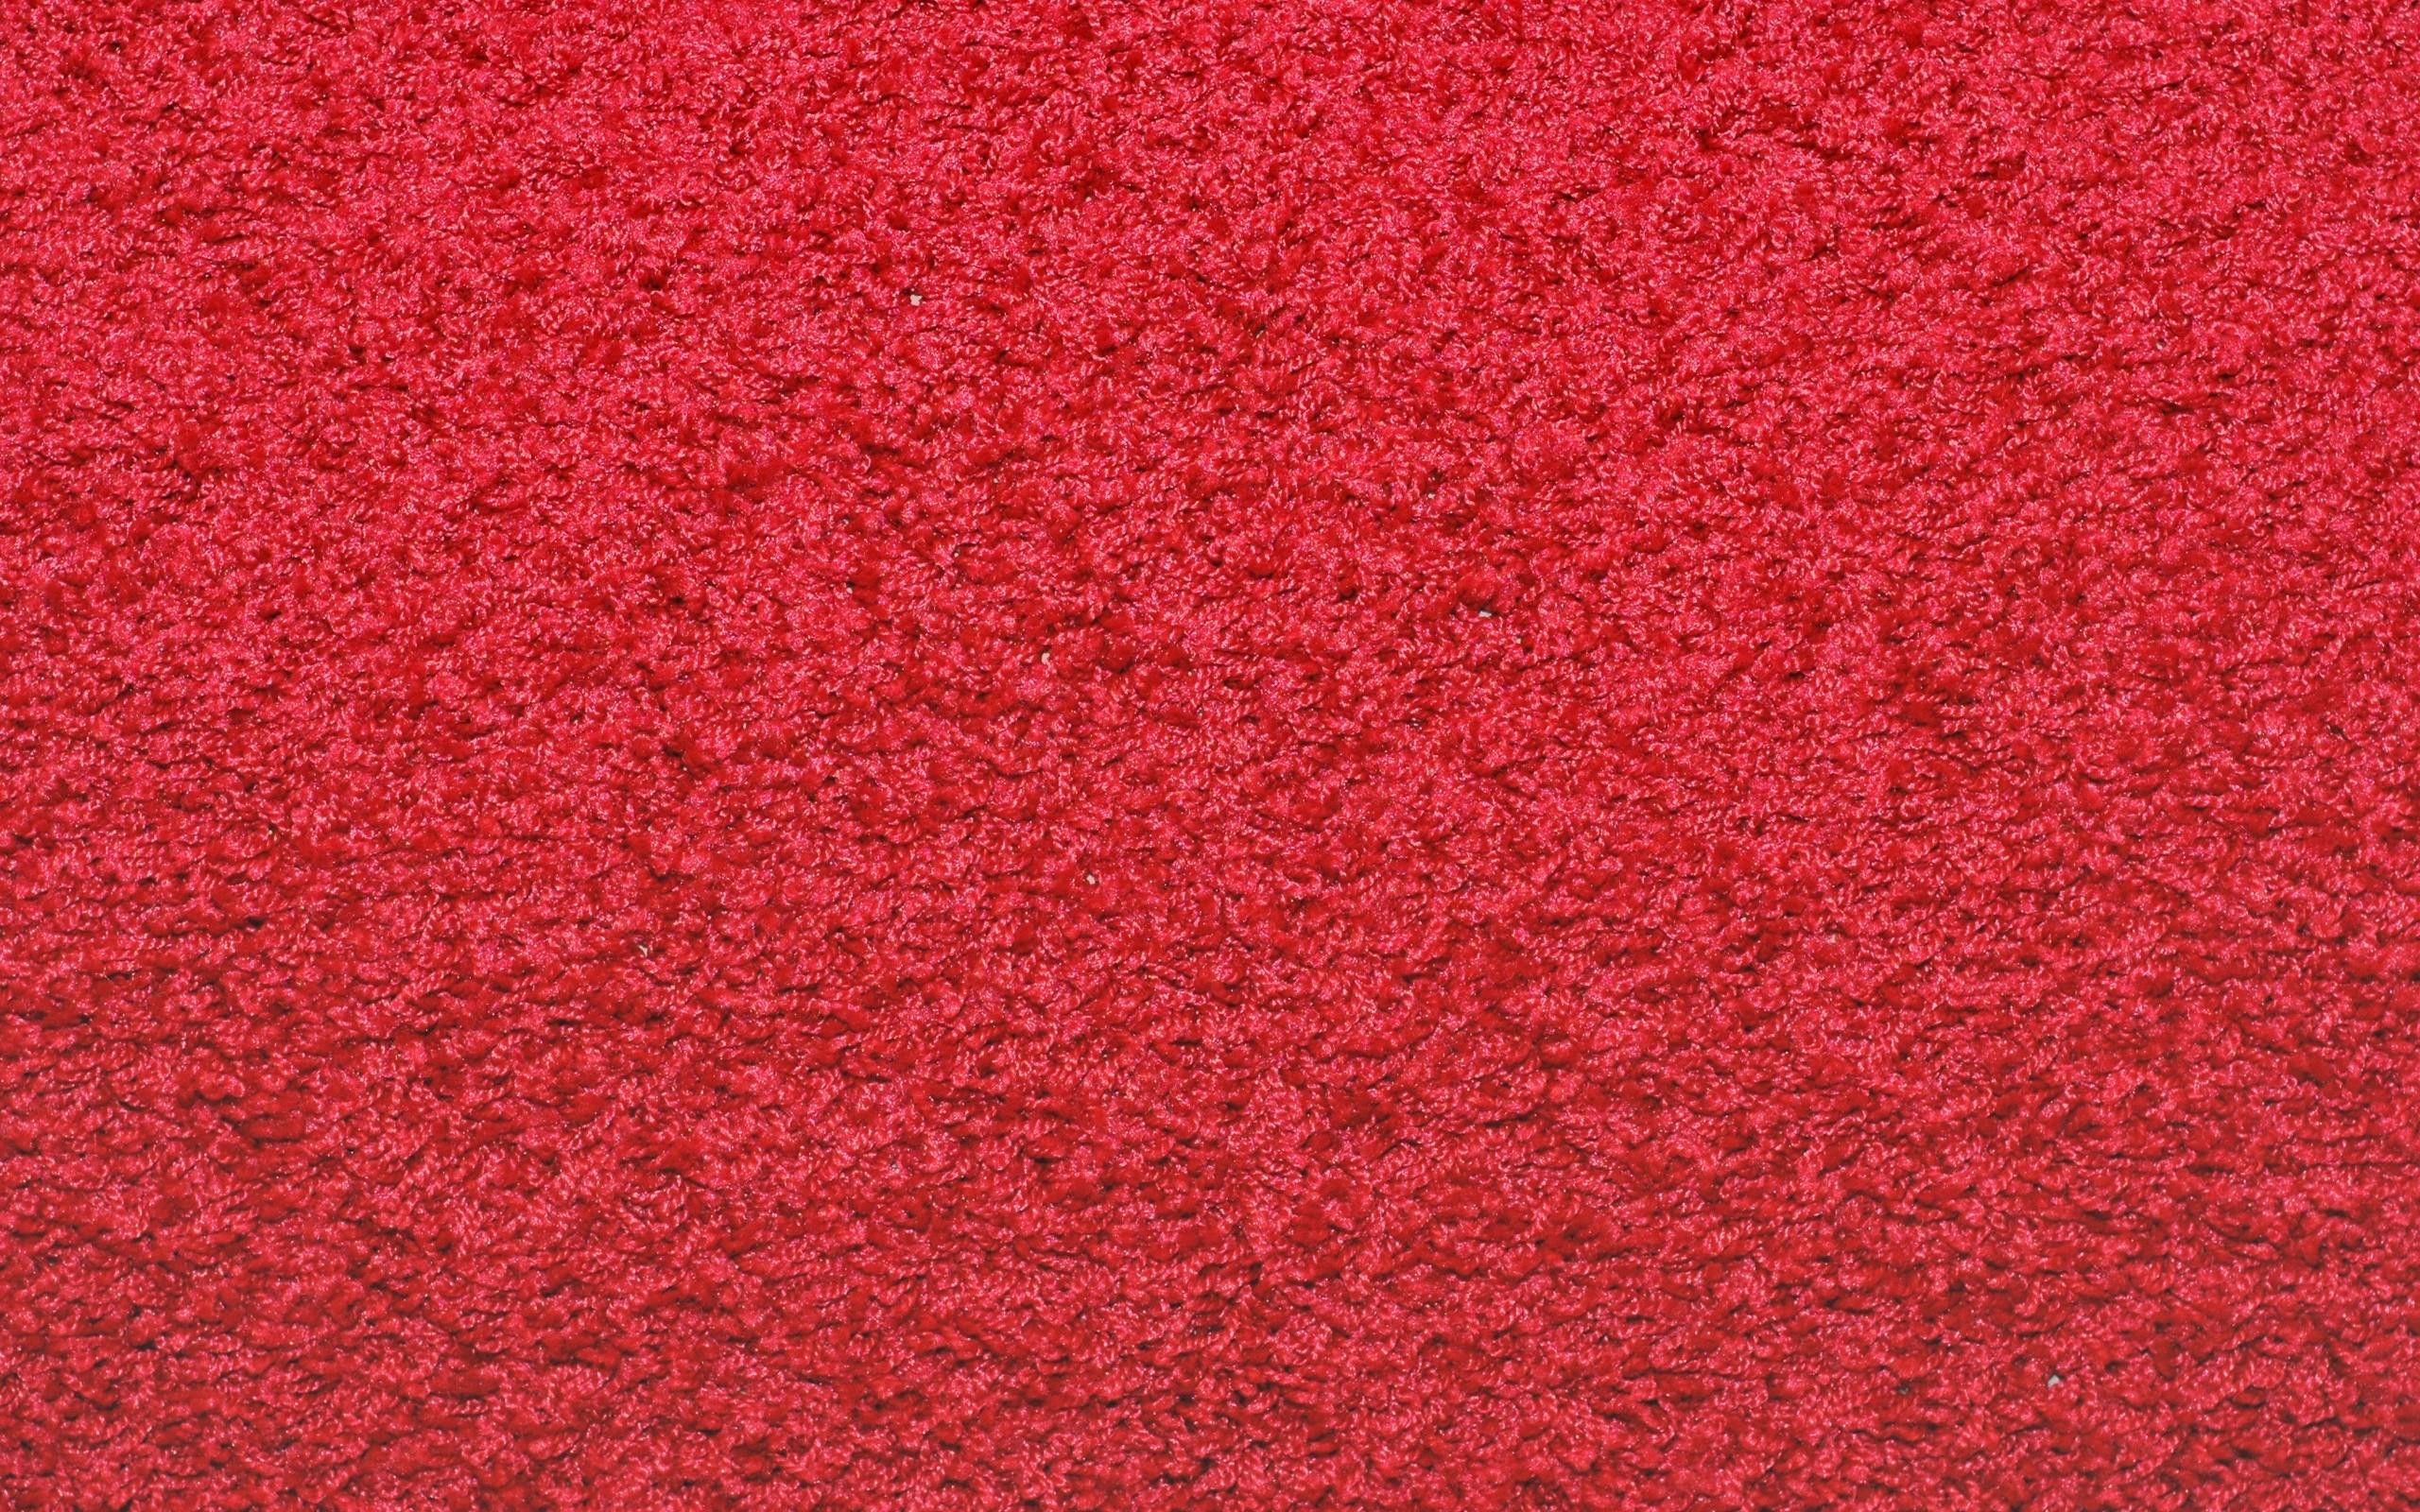 Red Carpet Wallpaper (46+ images)